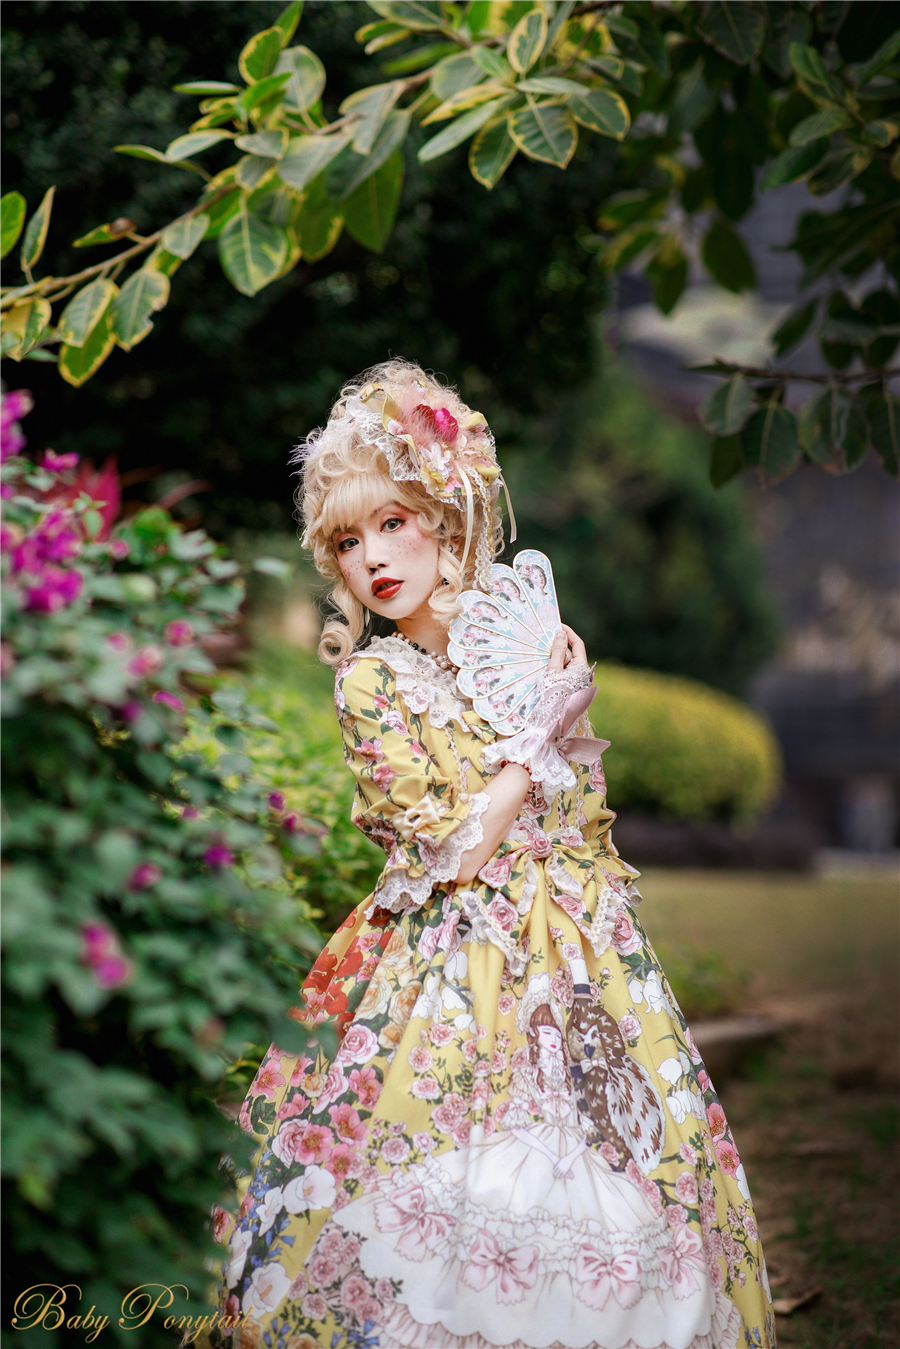 Baby Ponytail_Model Photo_Polly's Garden of Dreams_OP Yellow_Kaka_03.jpg